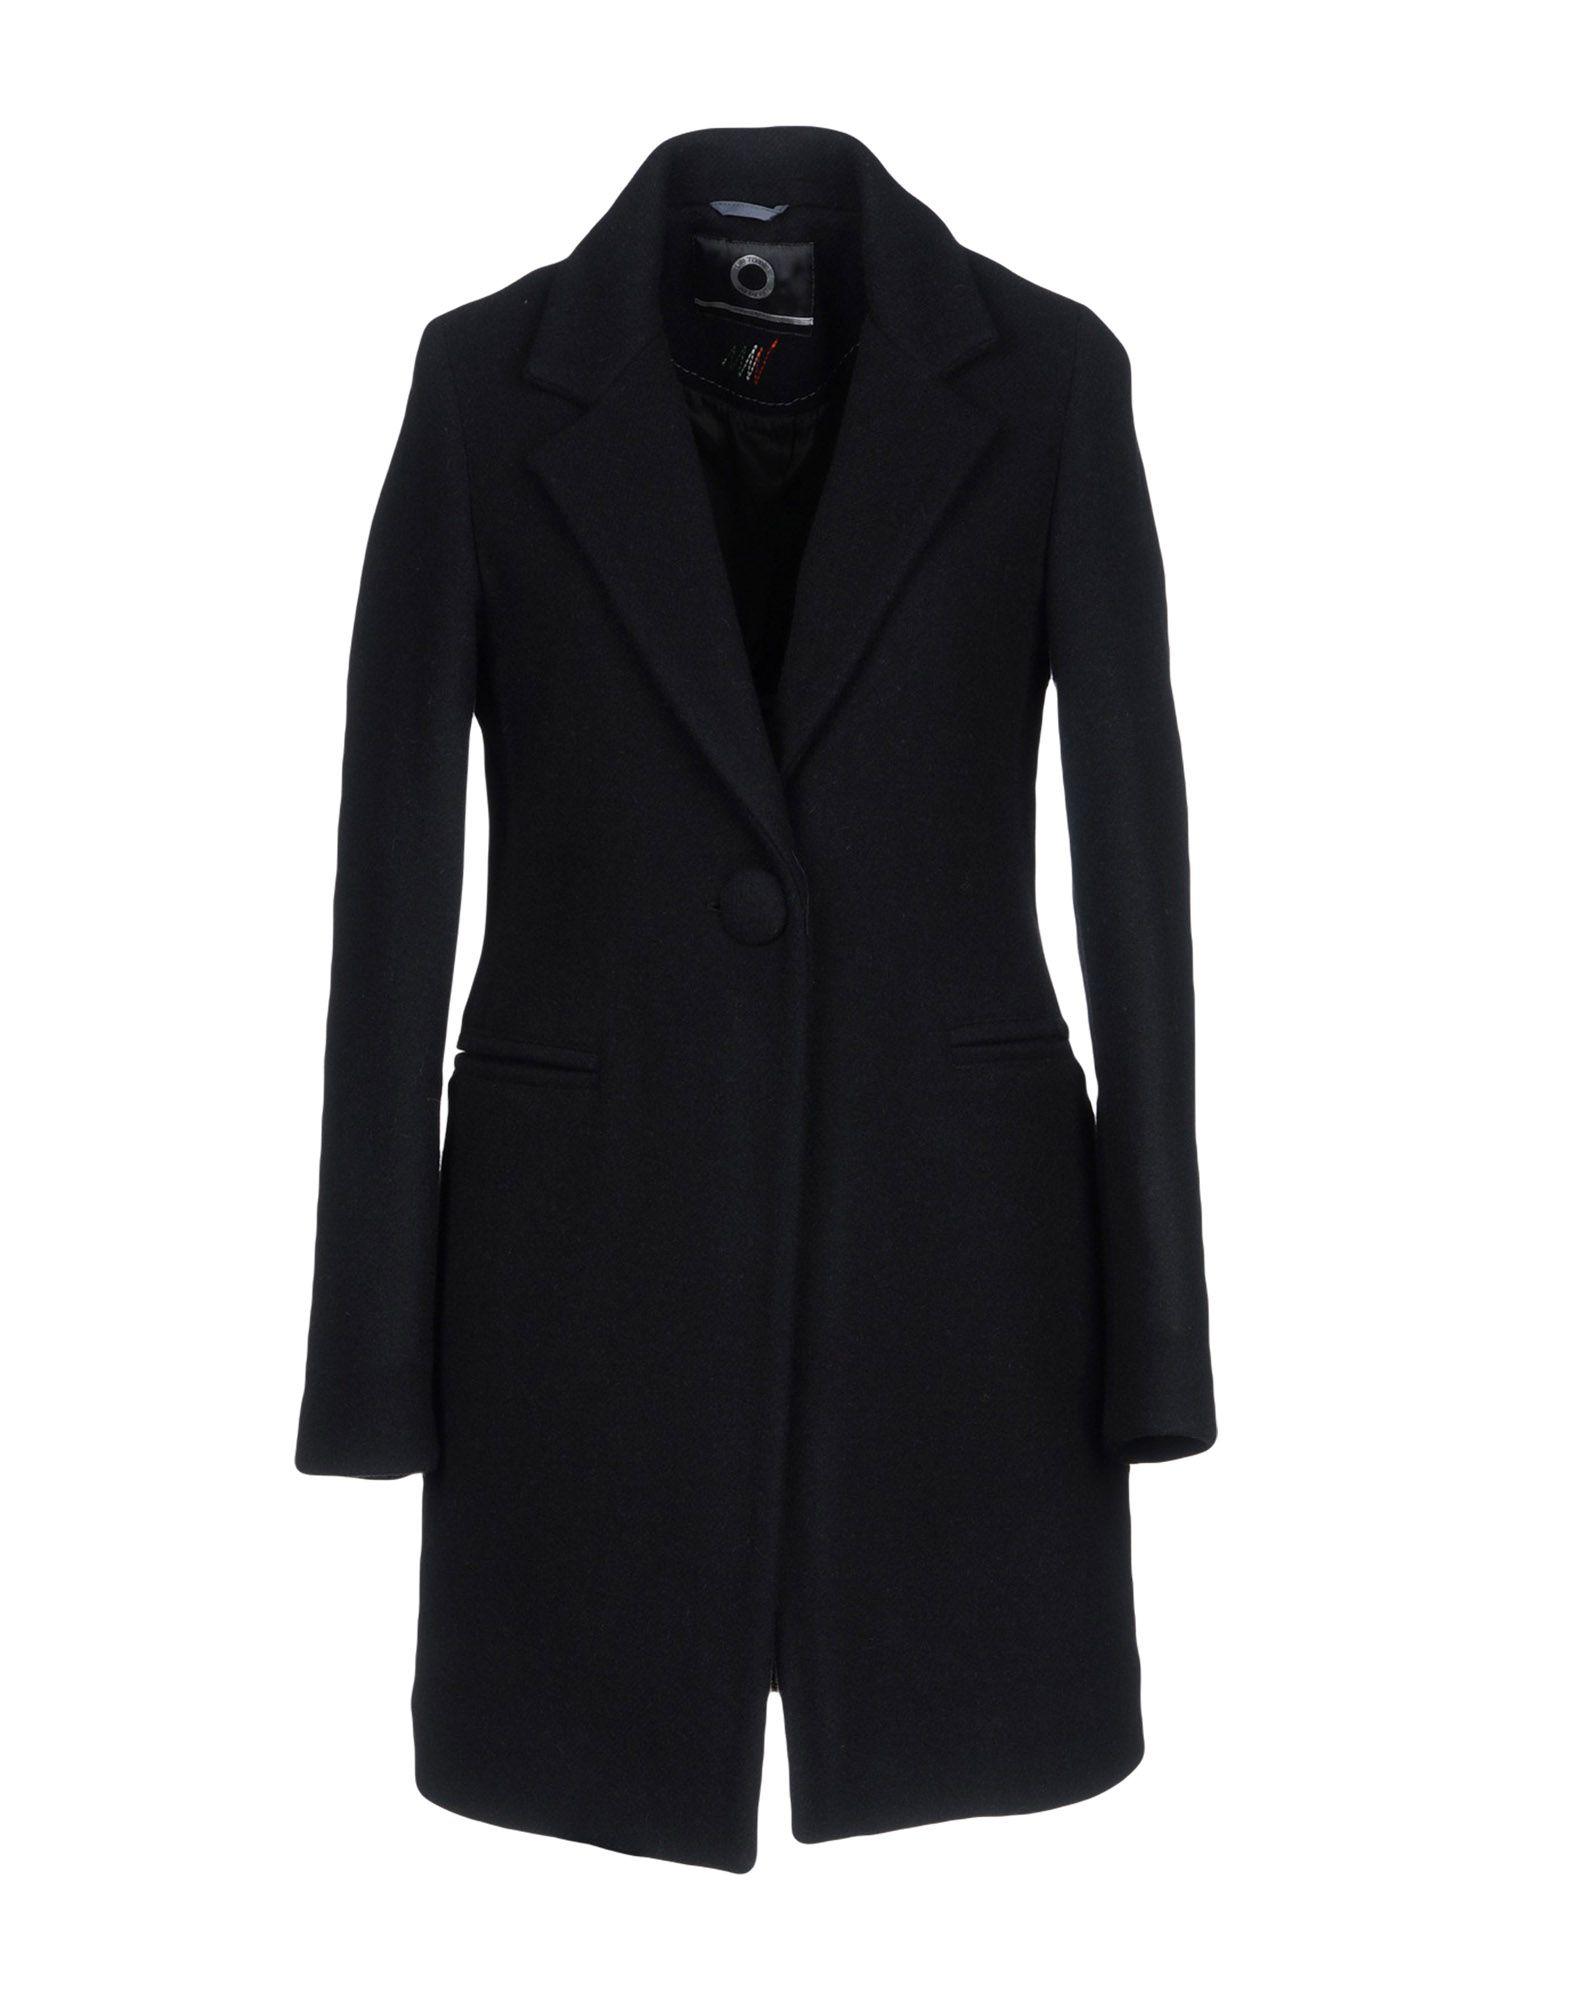 UP TO BE Пальто одежда для беременных to be